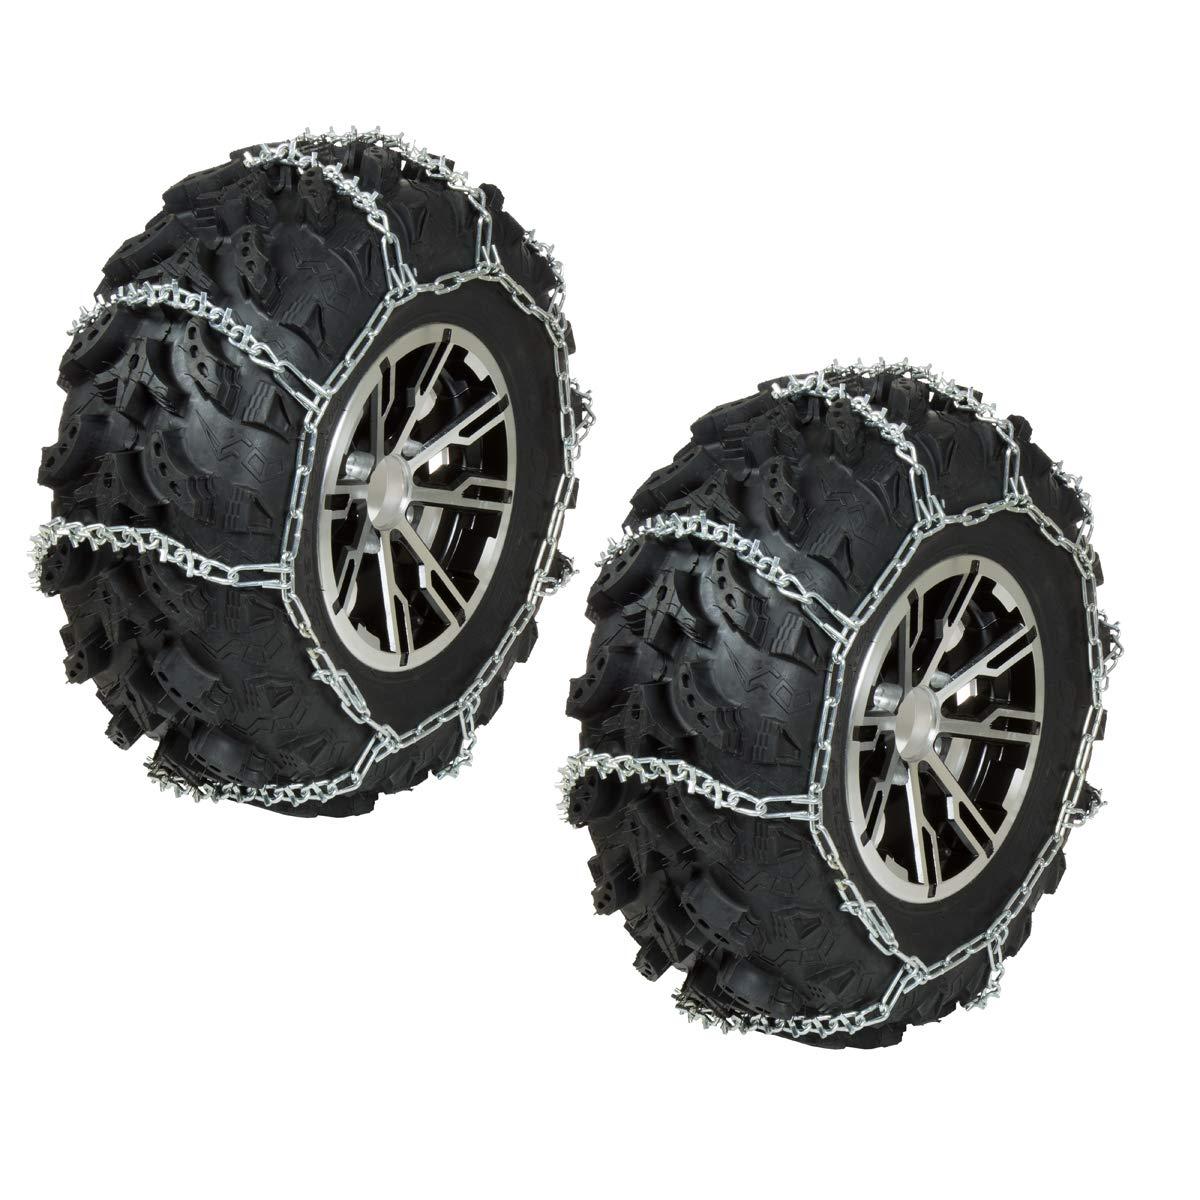 Raider 53 Inch 10 Inch TC1 53'' Length x 10'' Width ATV Tire Chain Set